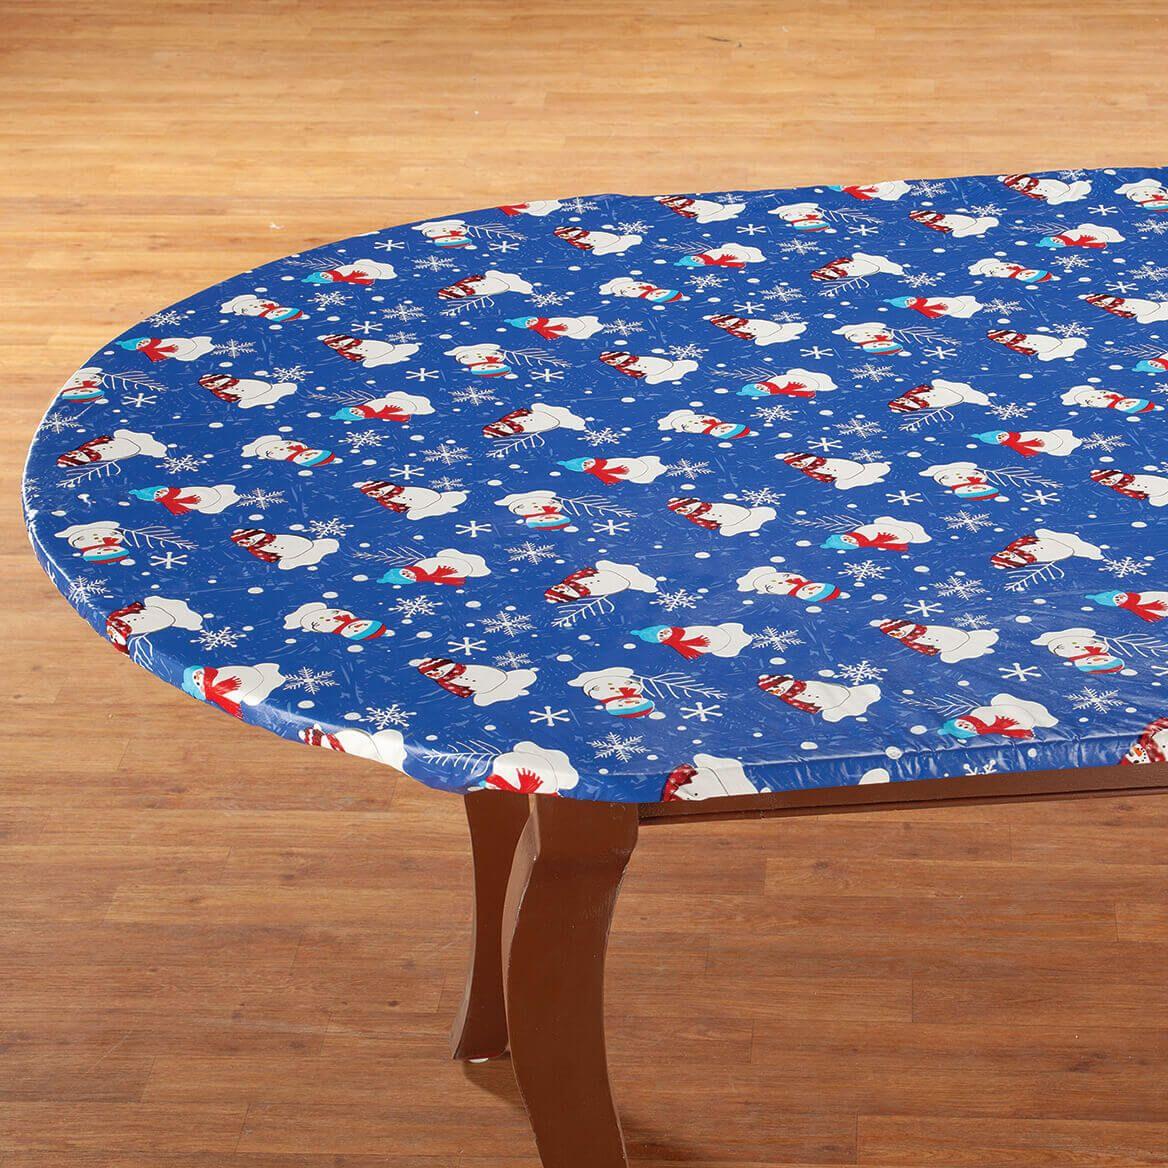 Snowman Fun Elasticized Table Cover by Chef's Pride™-372387